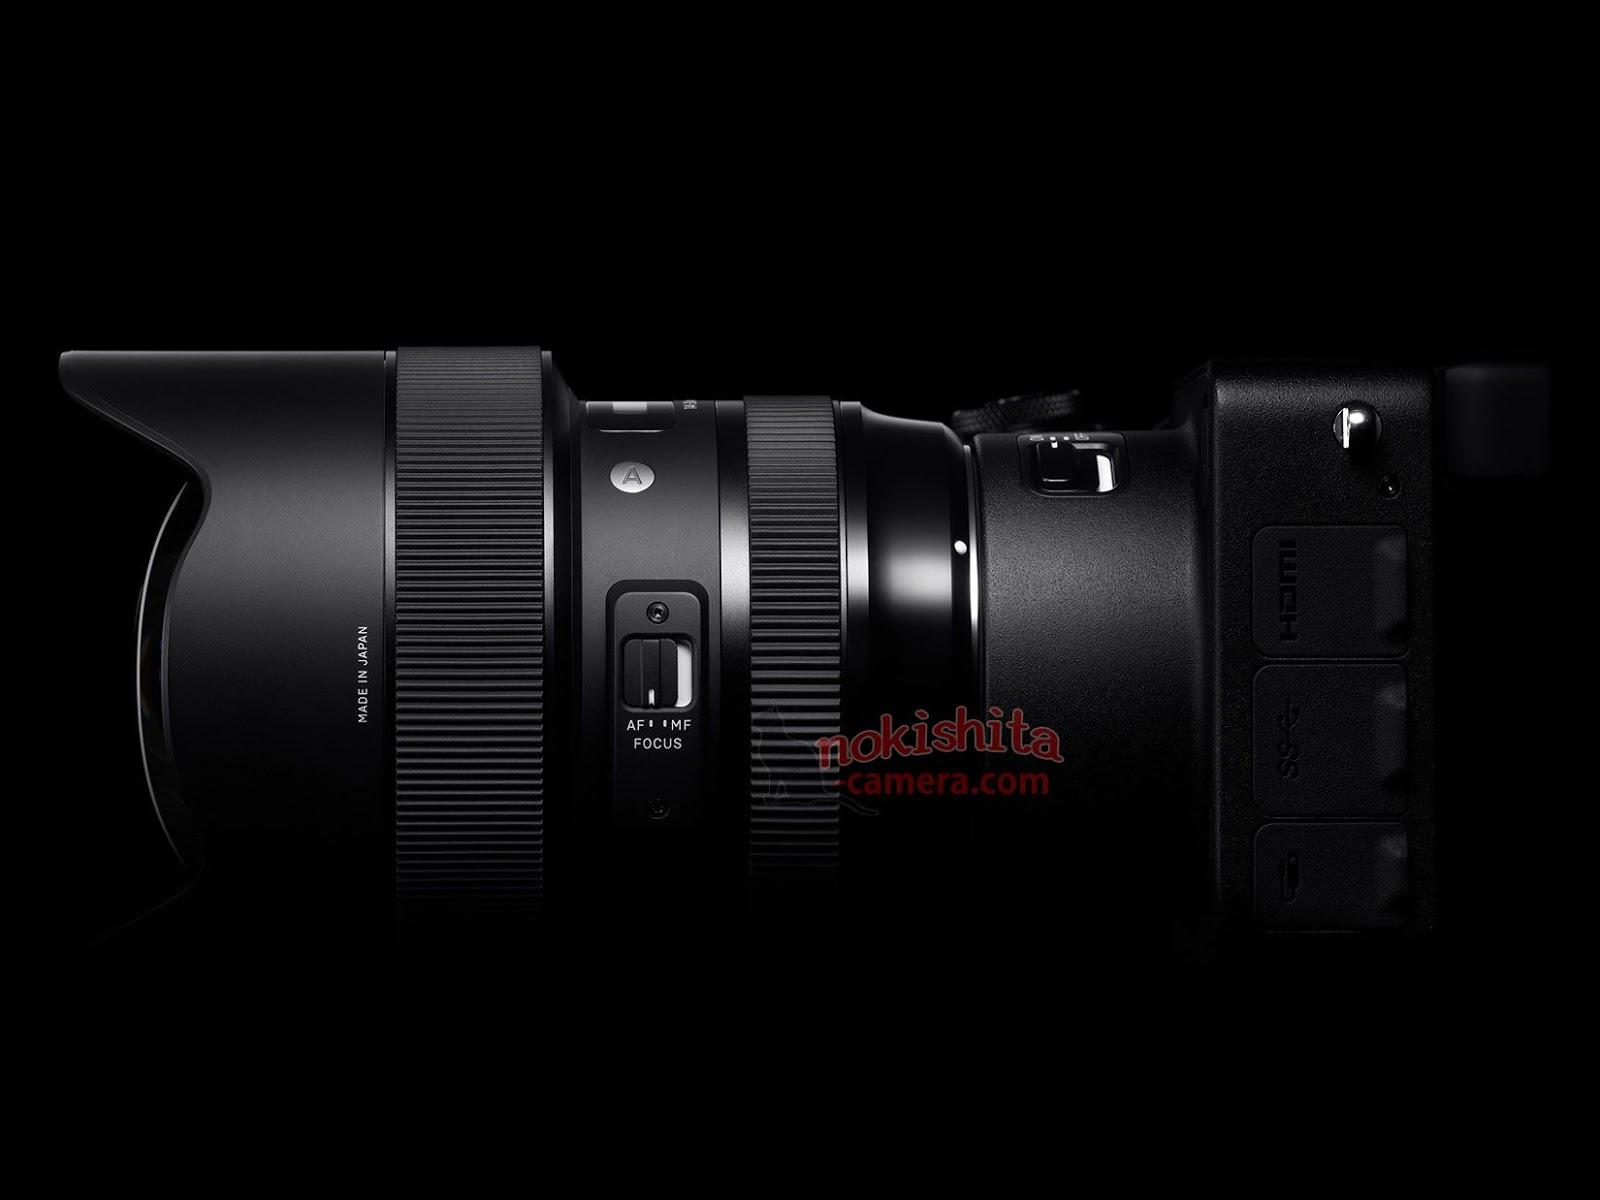 Sigma 14-24mm f/2.8 DG HSM Art на камере sd Quattro H